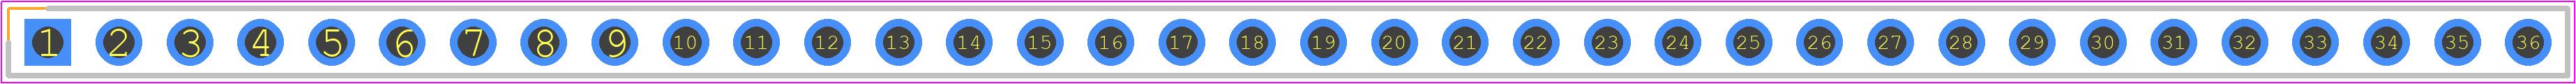 68000-136 - FCI PCB footprint - Header, Vertical - 68000-136